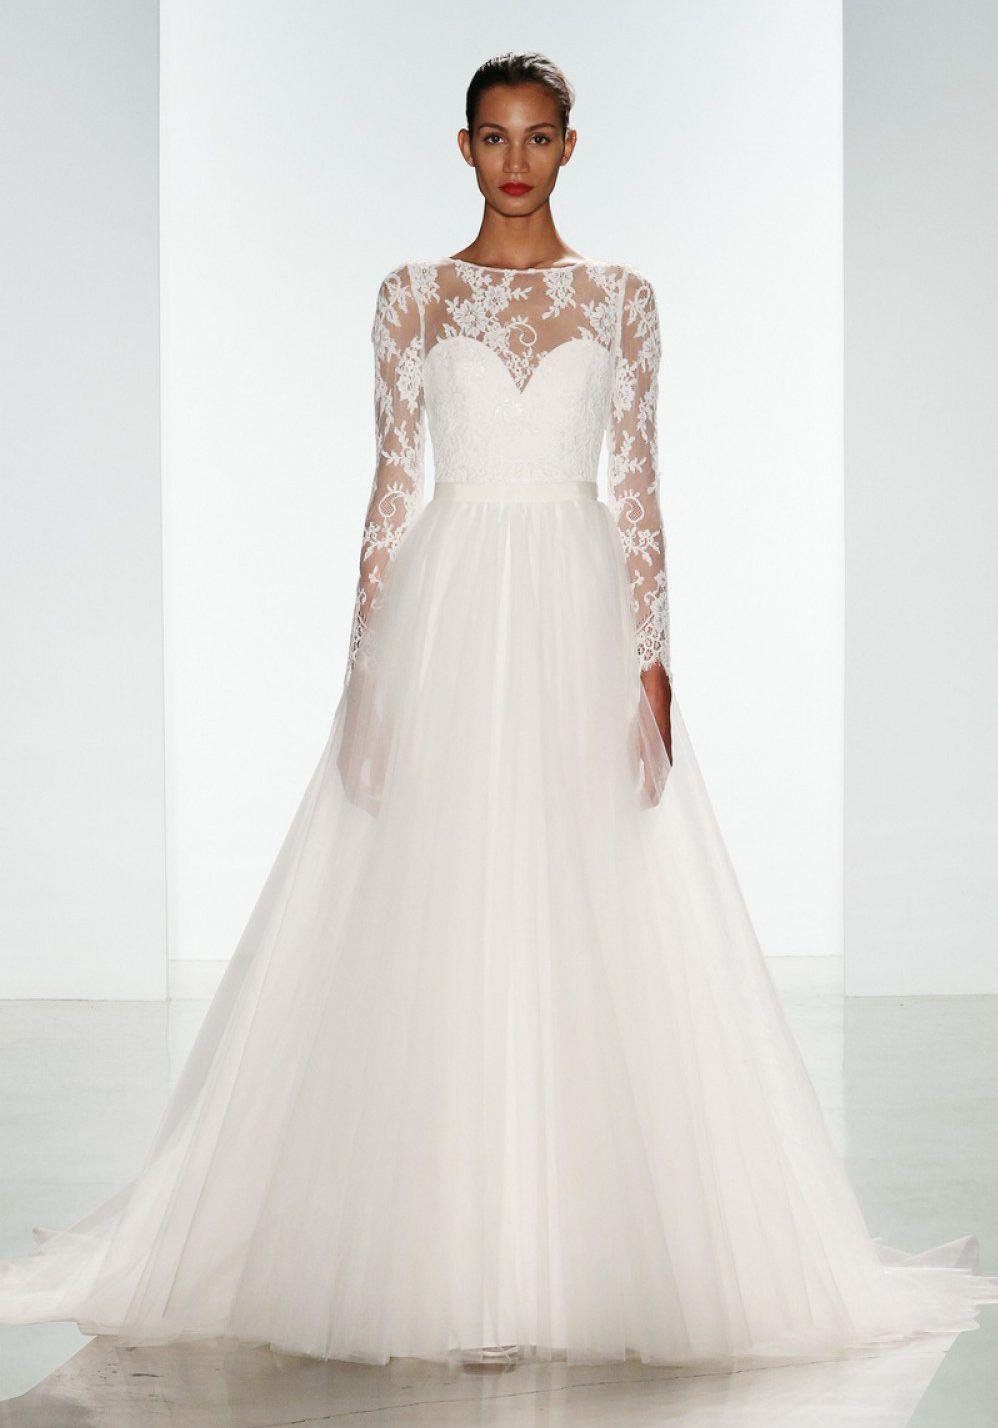 black wedding dress designers to wear on the big day pinterest